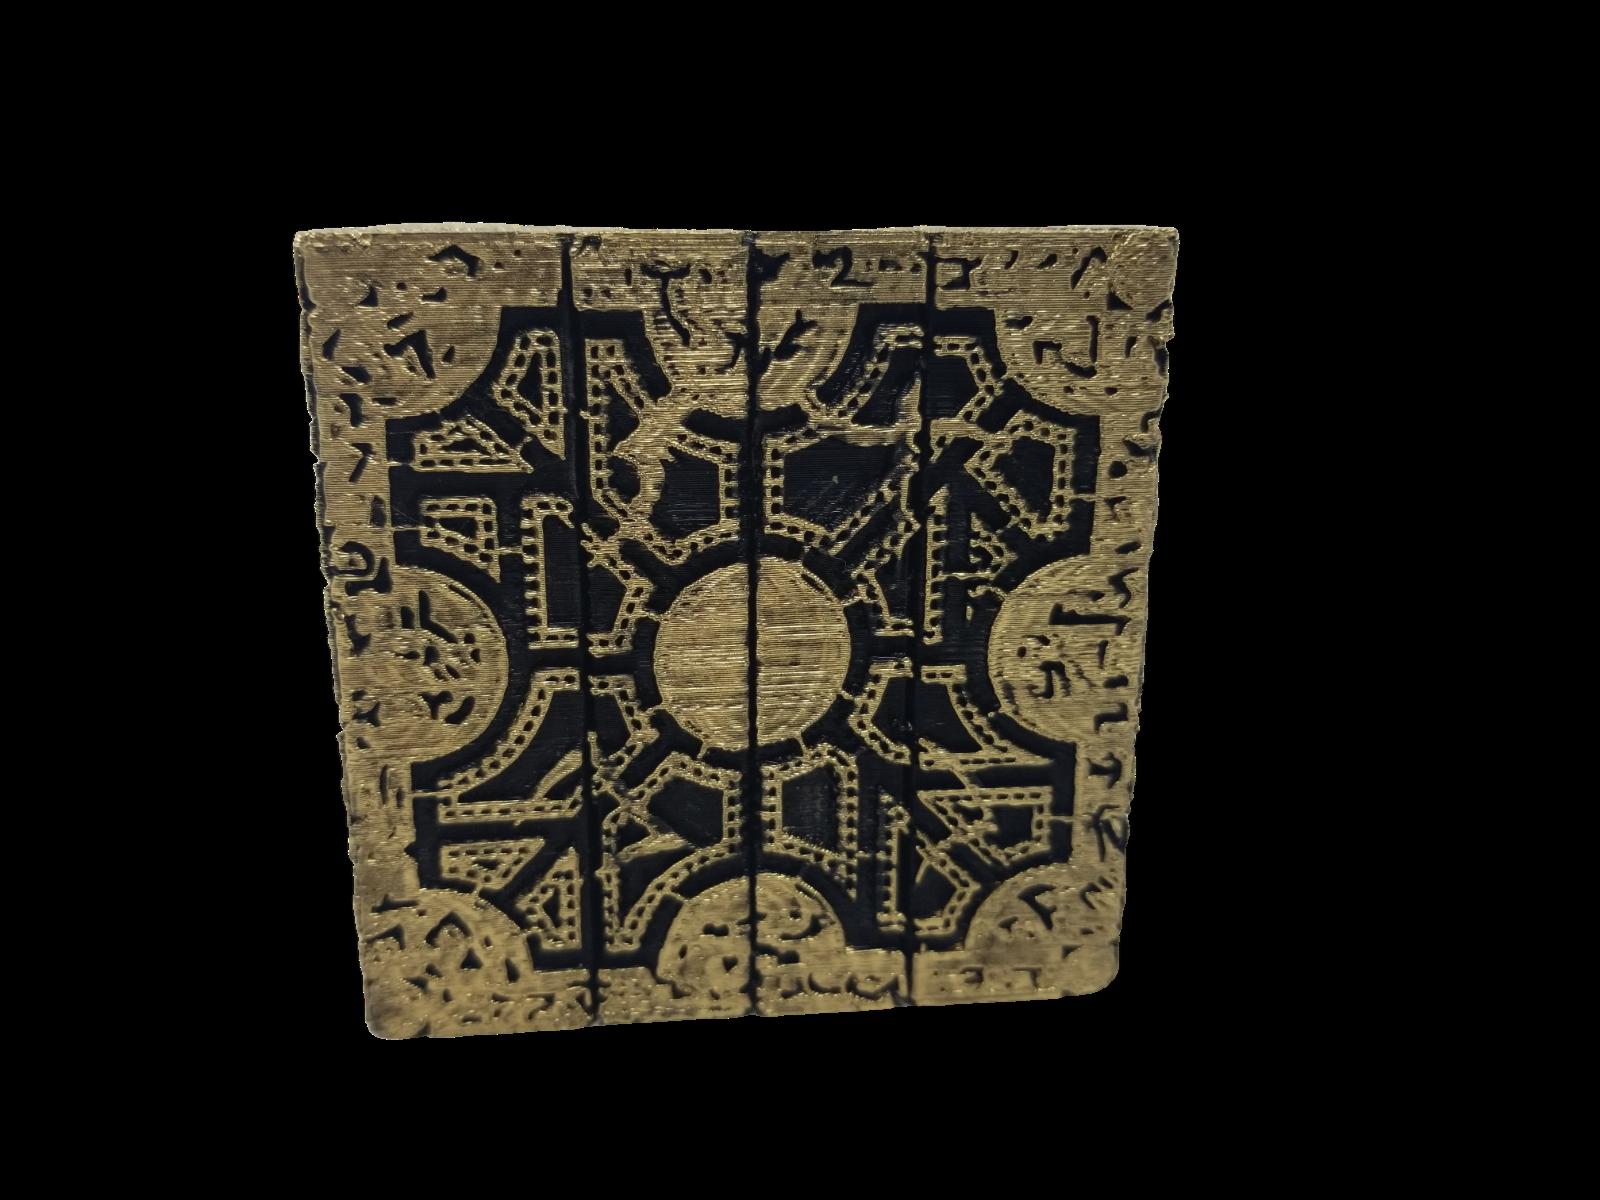 Hellraiser Cube Puzzle Box Lament Configuration  Functional Pinhead Prop Horror 5